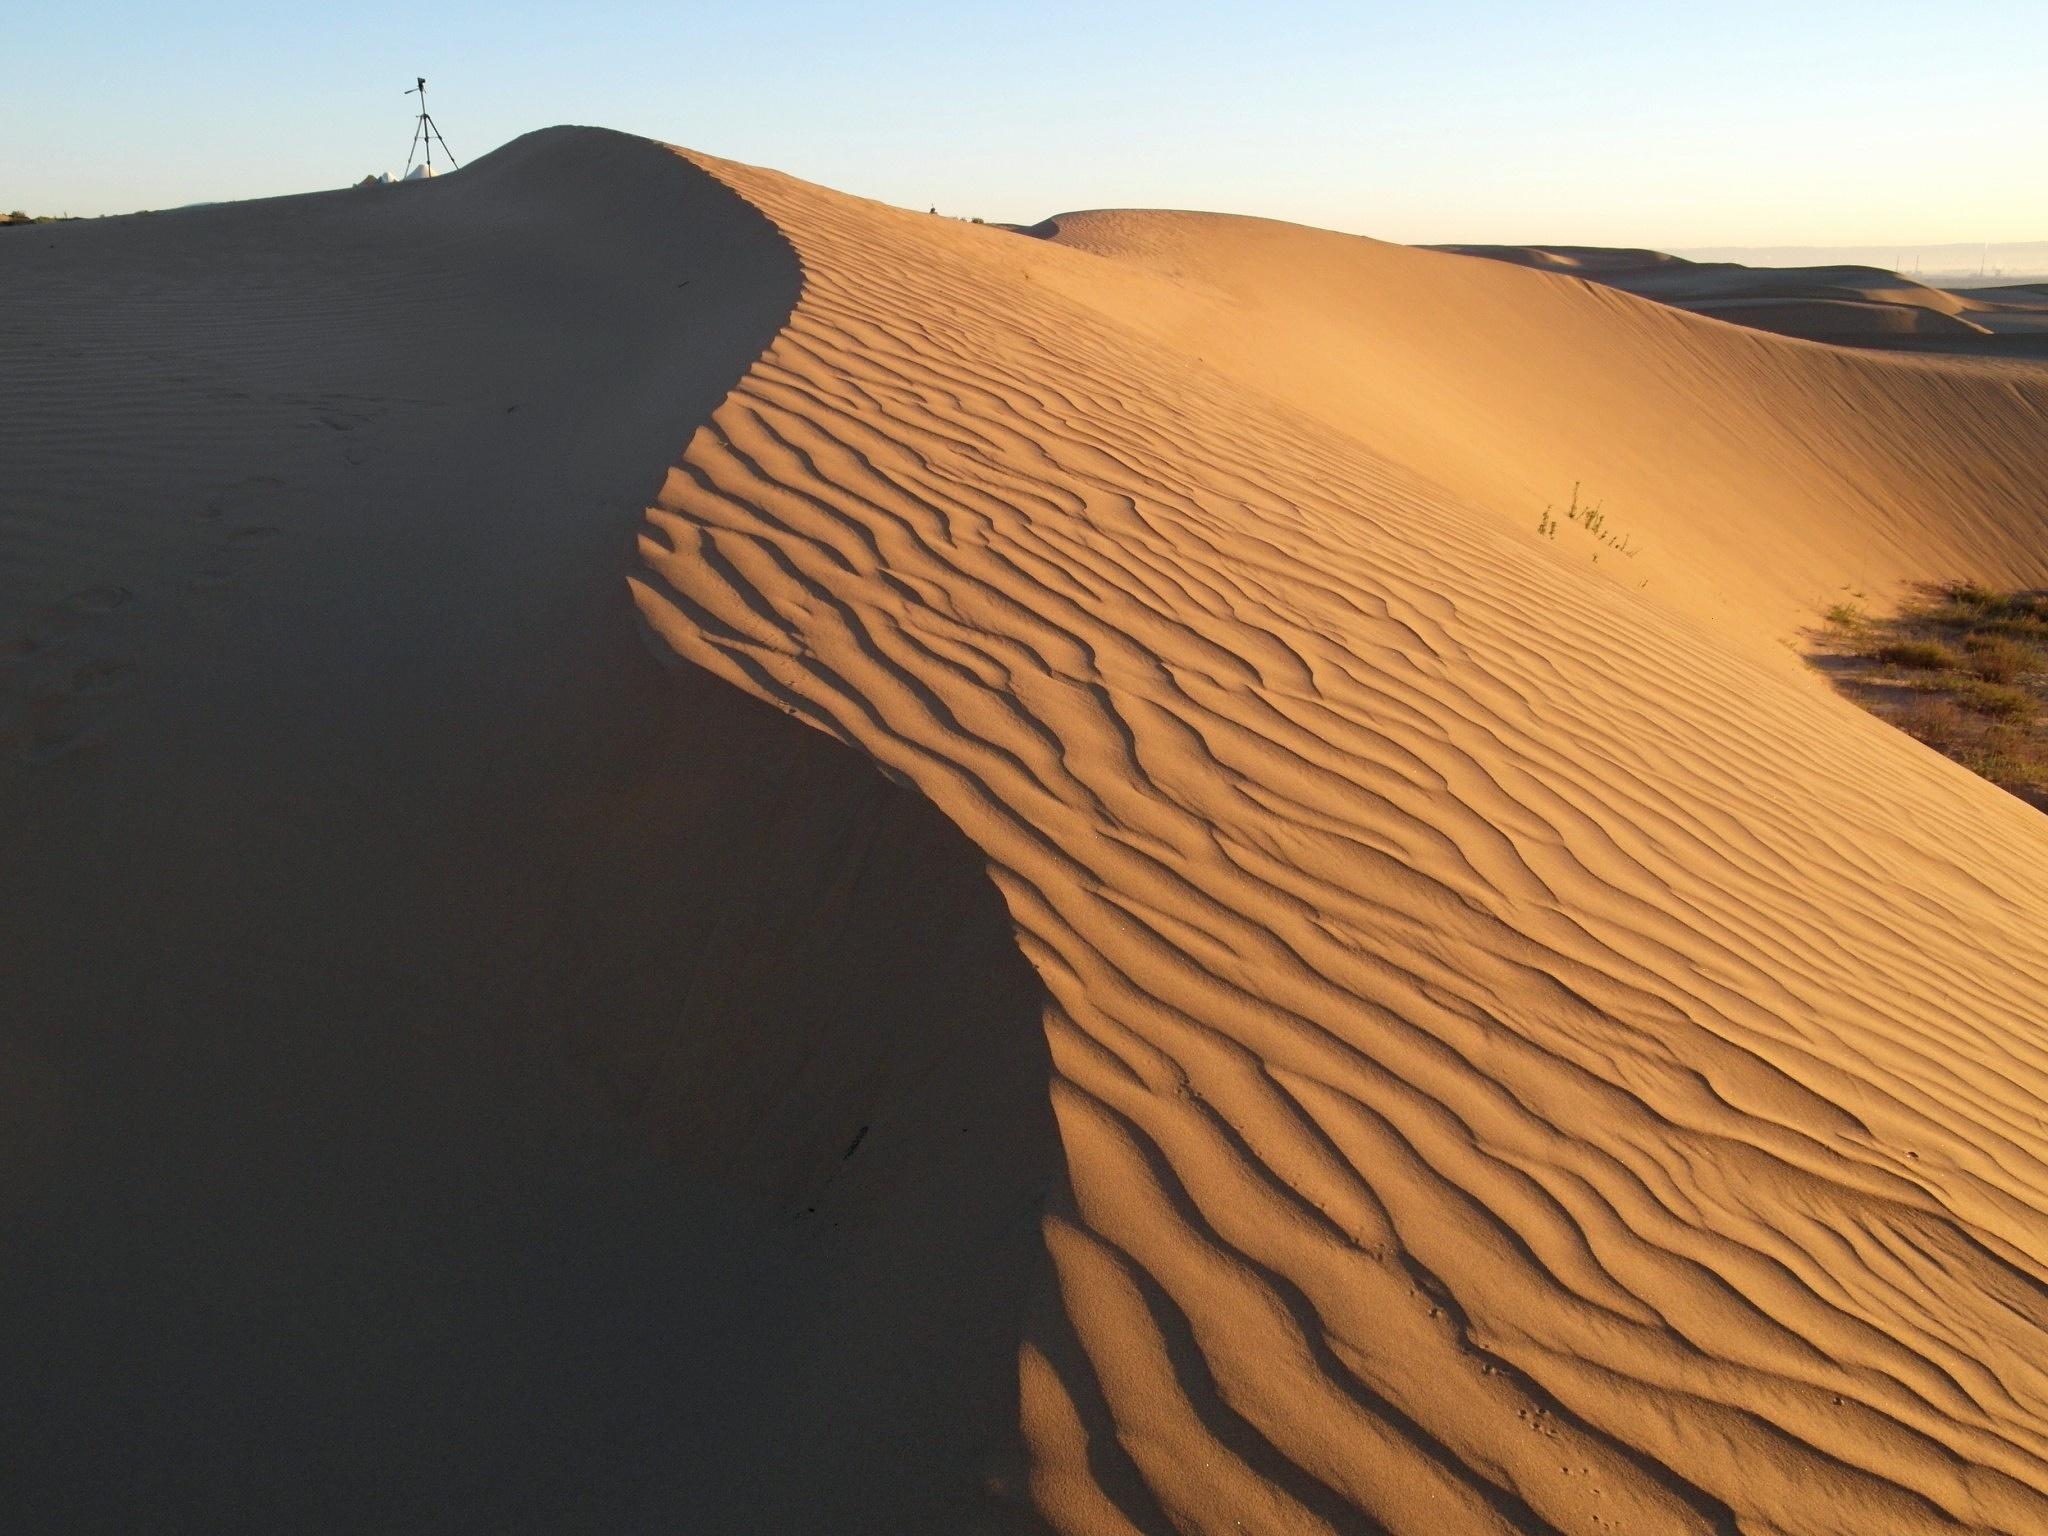 Sunrise, Xiangshawan desert by pop88123